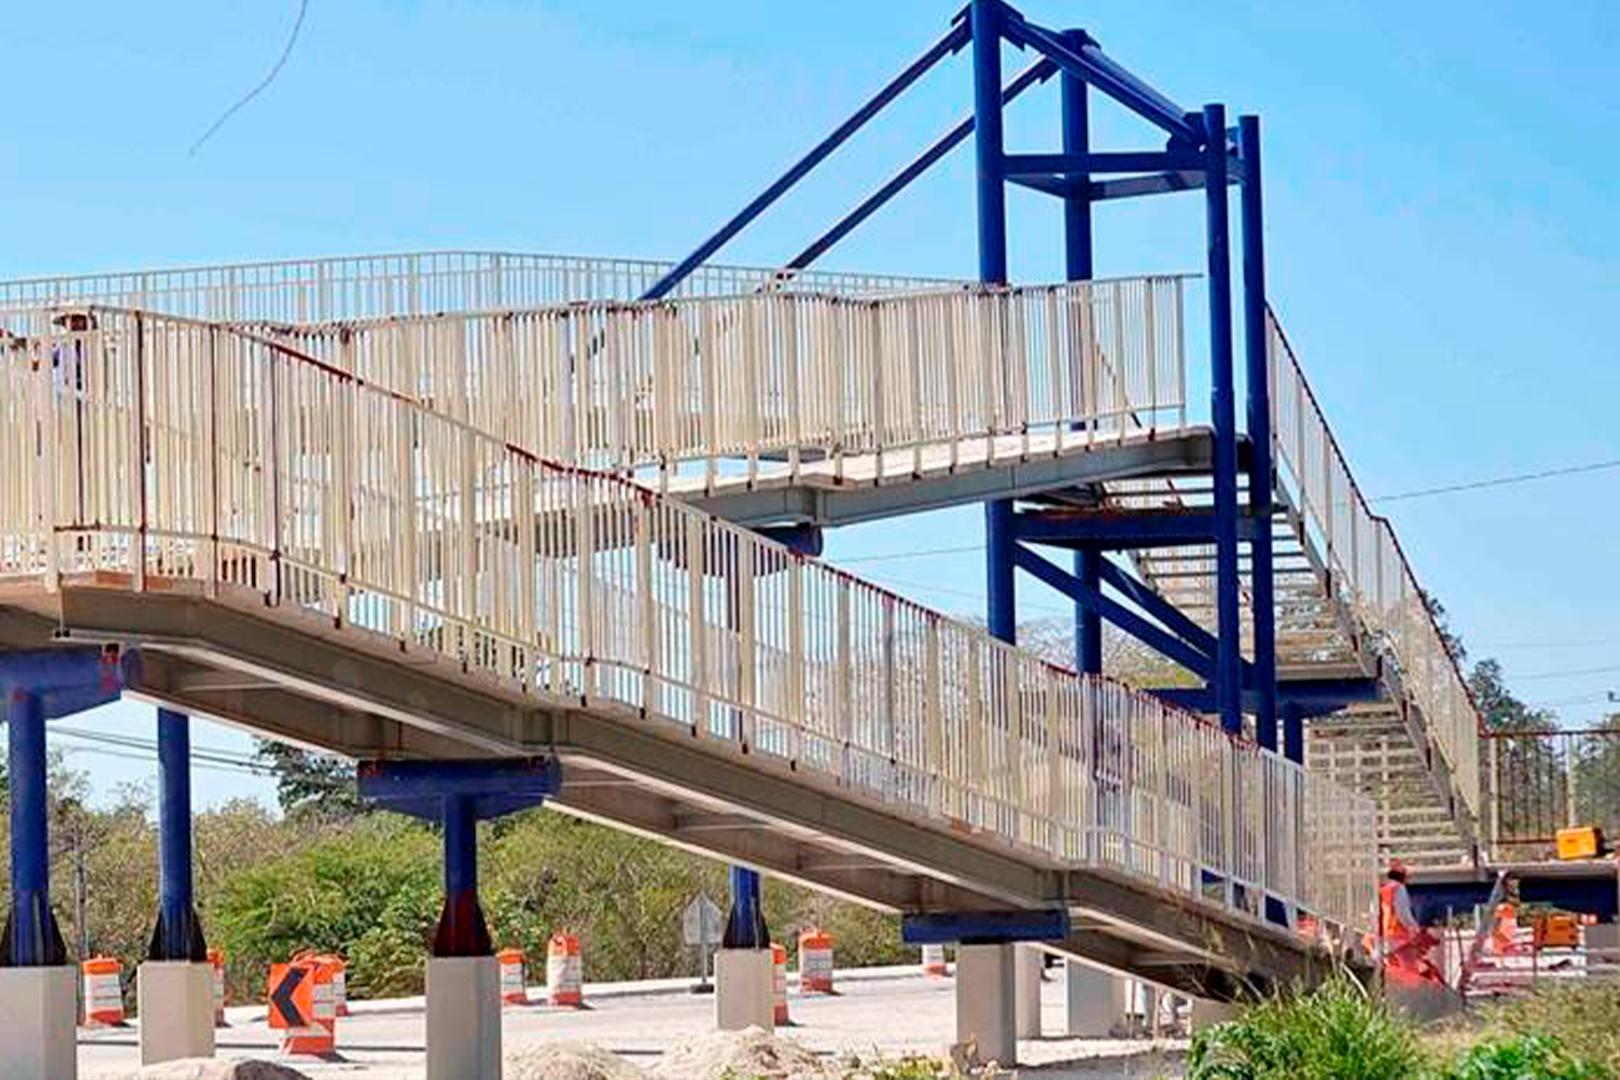 Pasarelas Carretera interamericana Norte: Cañas-Liberia